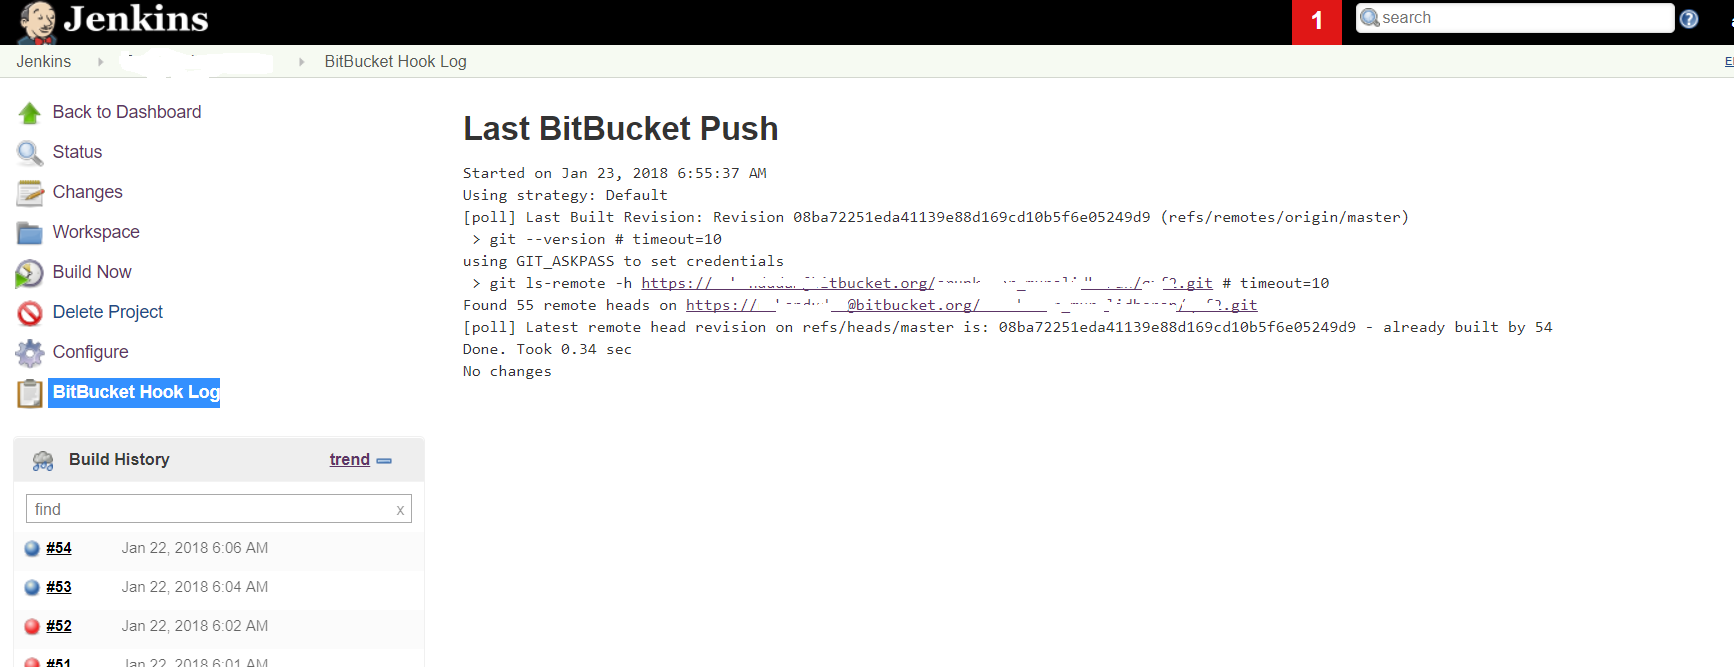 bitbucket_hook_log